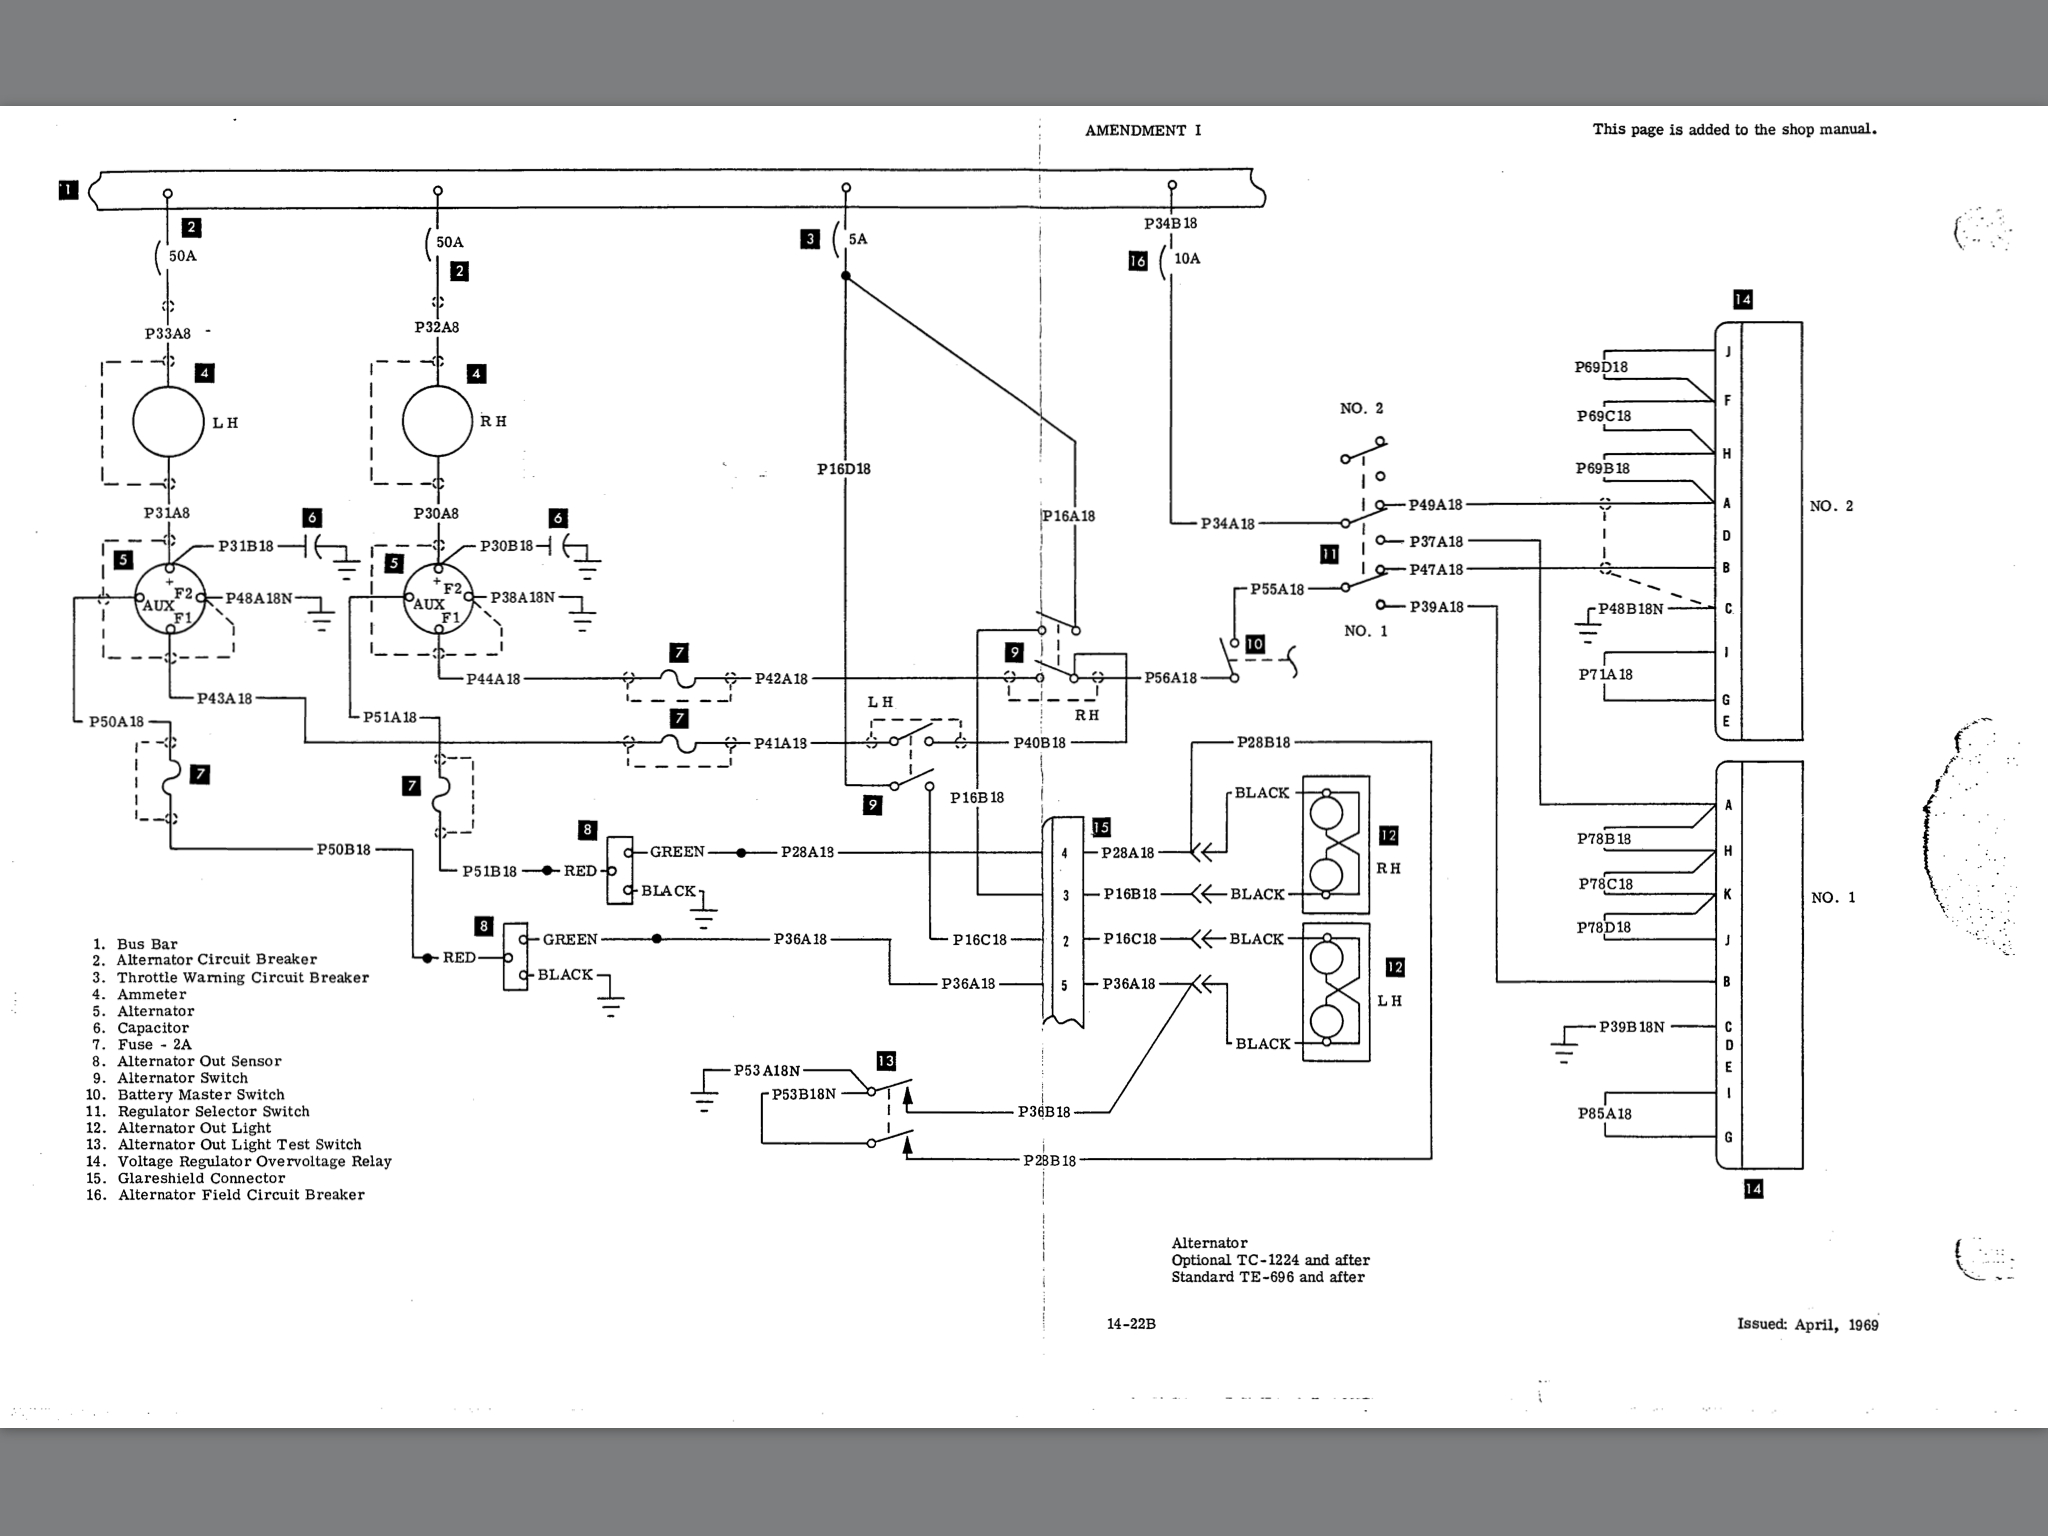 wiring diagram manual beech 300